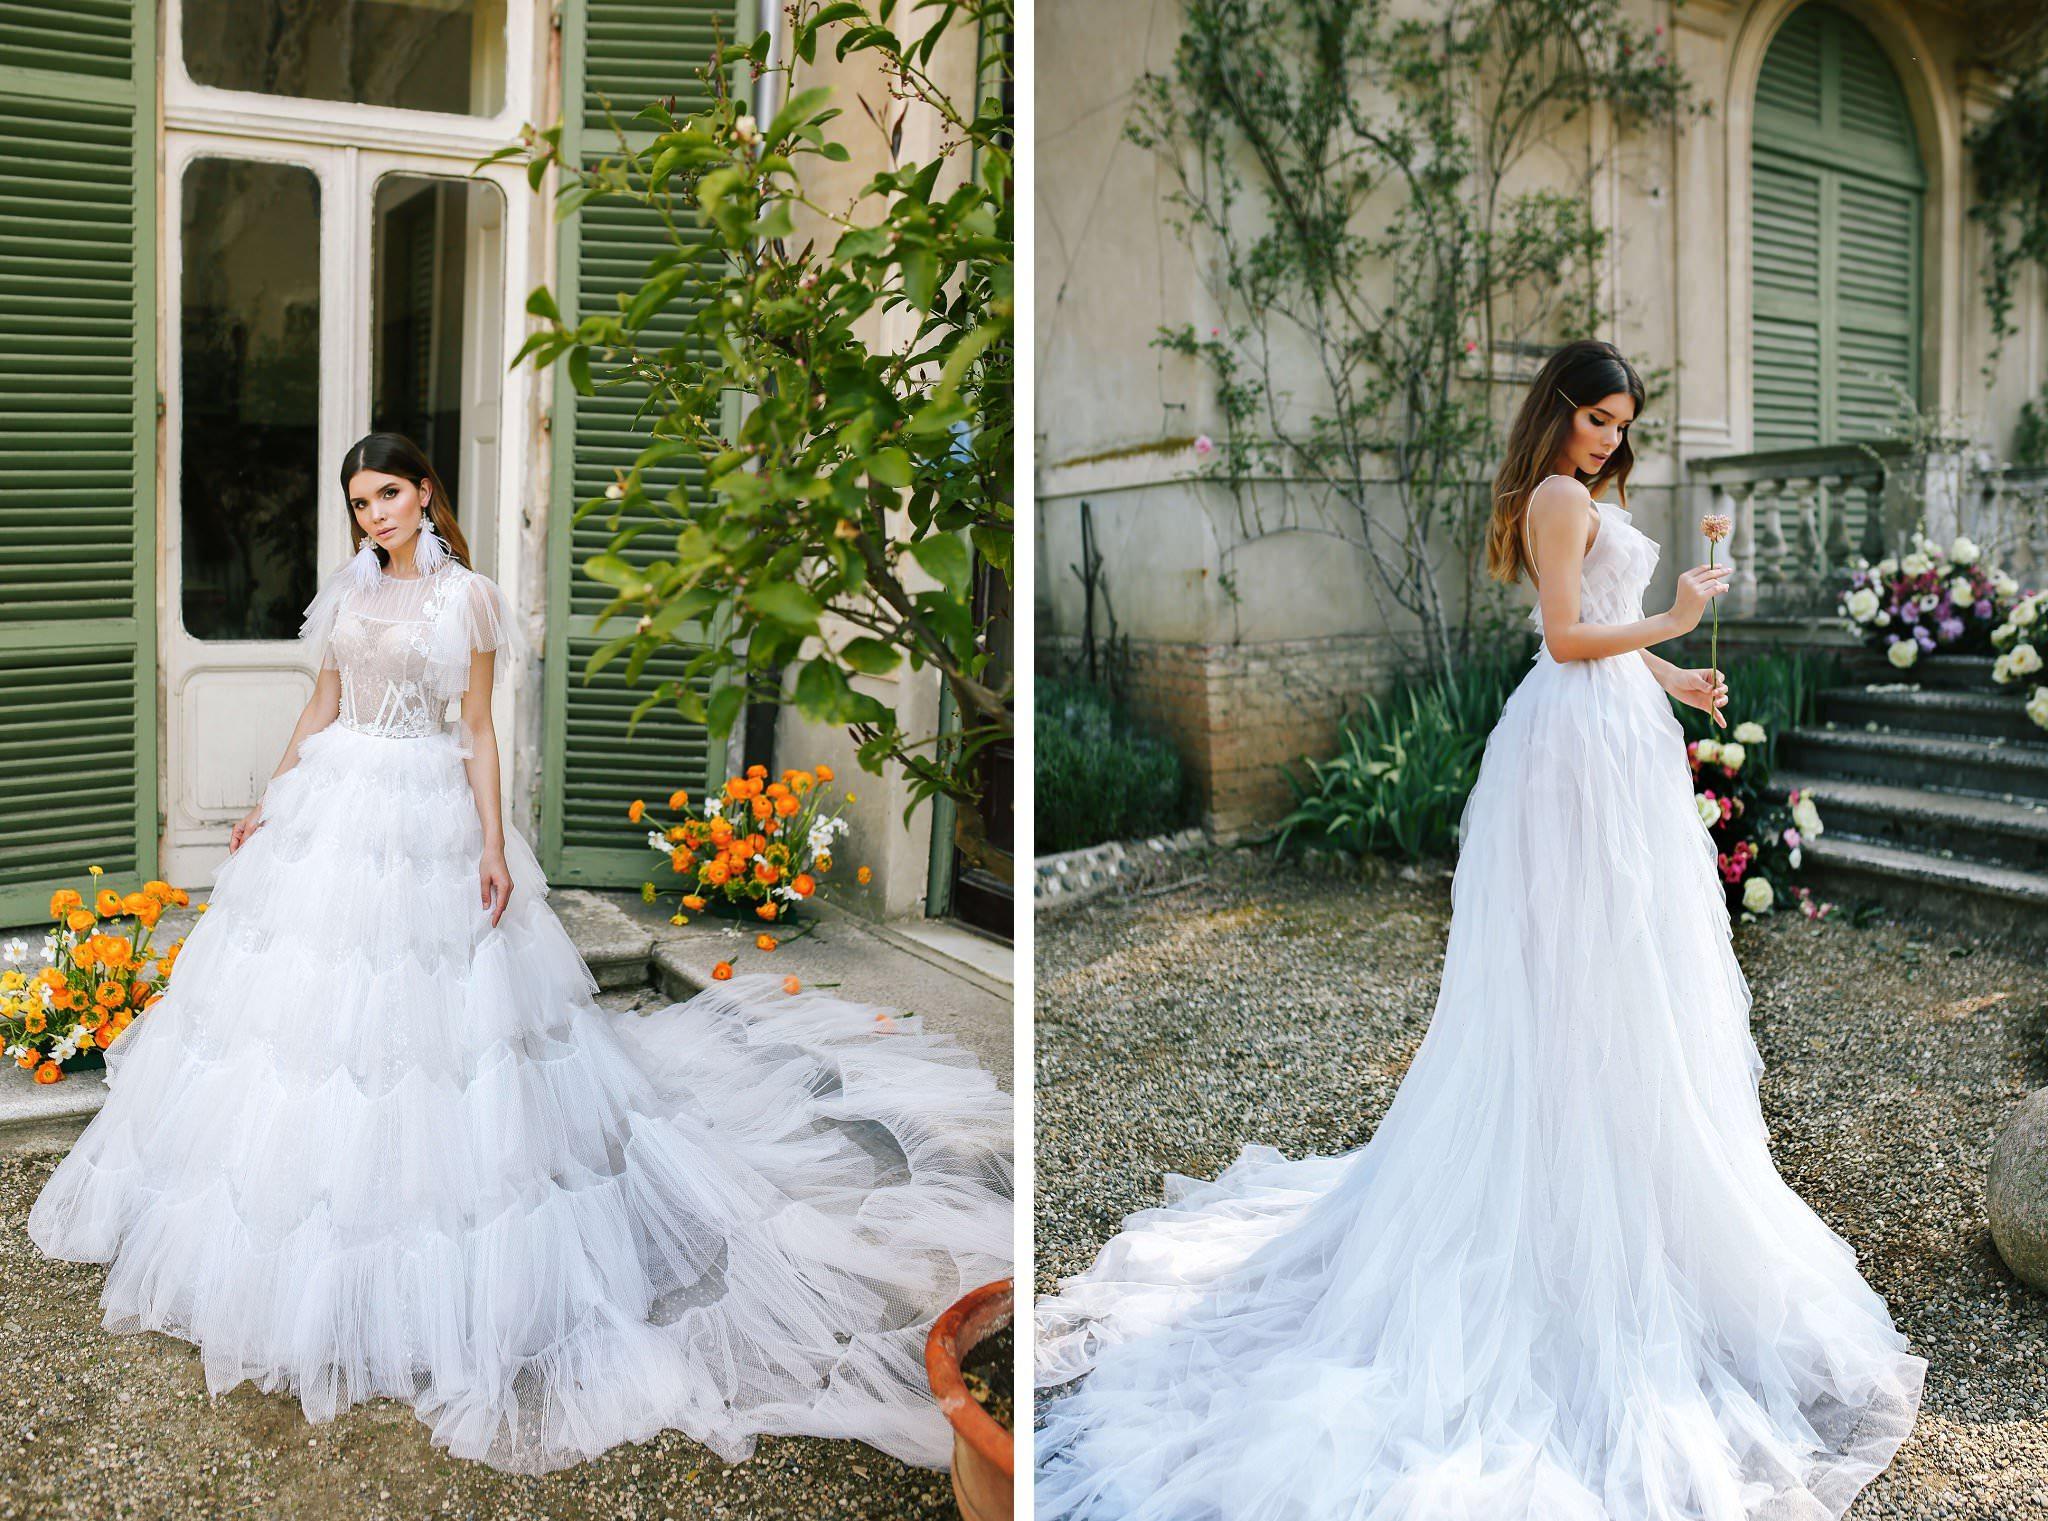 Buy wedding dress in Vancouver